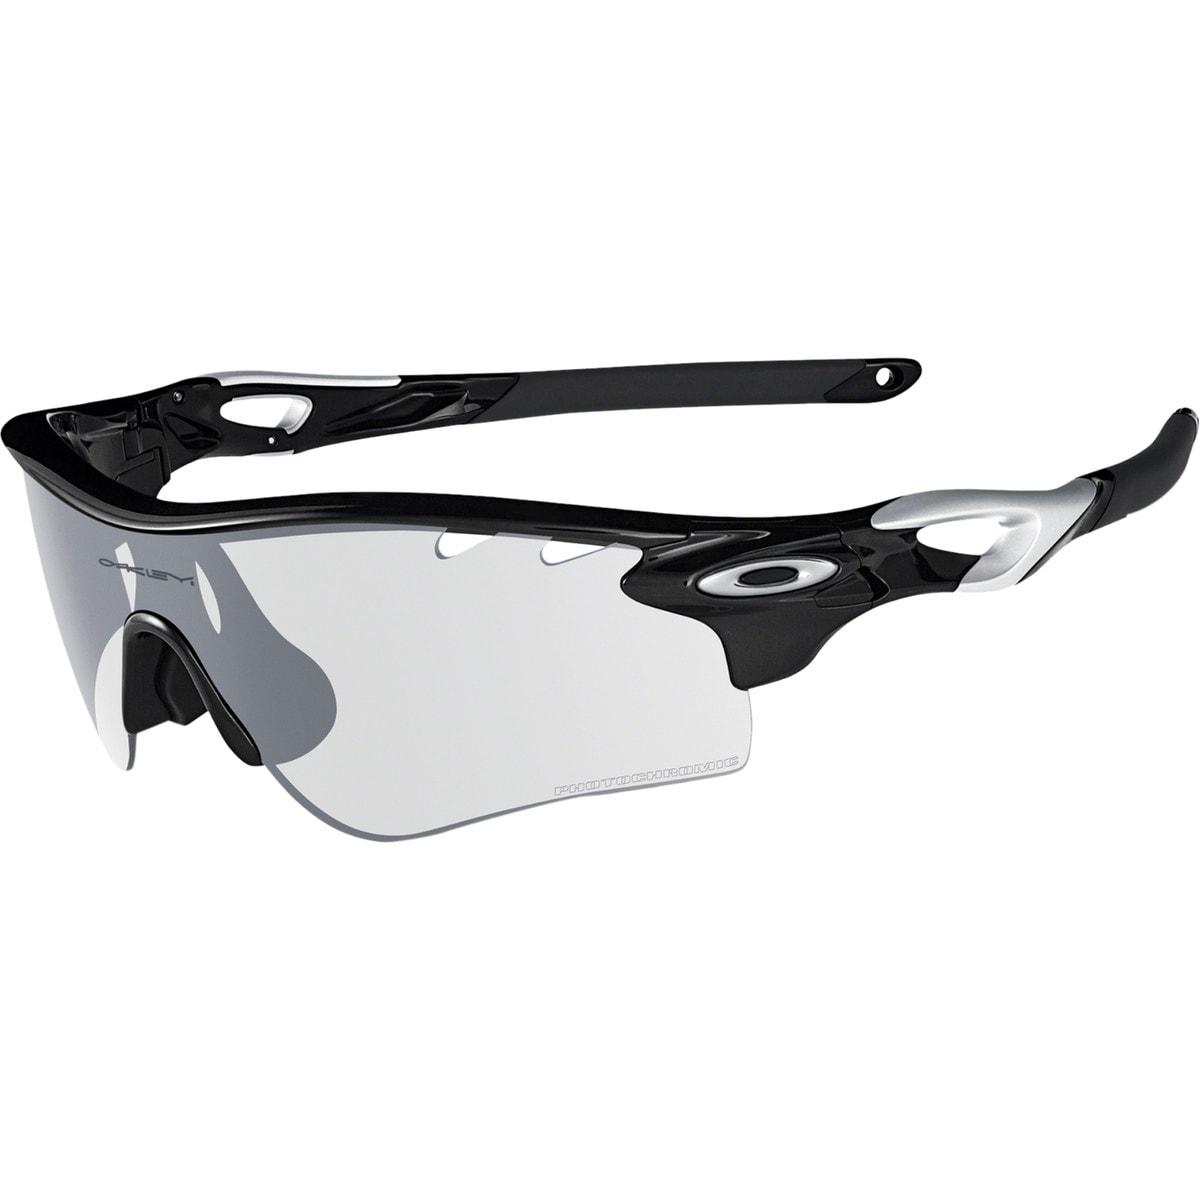 oakley polarized photochromic sunglasses